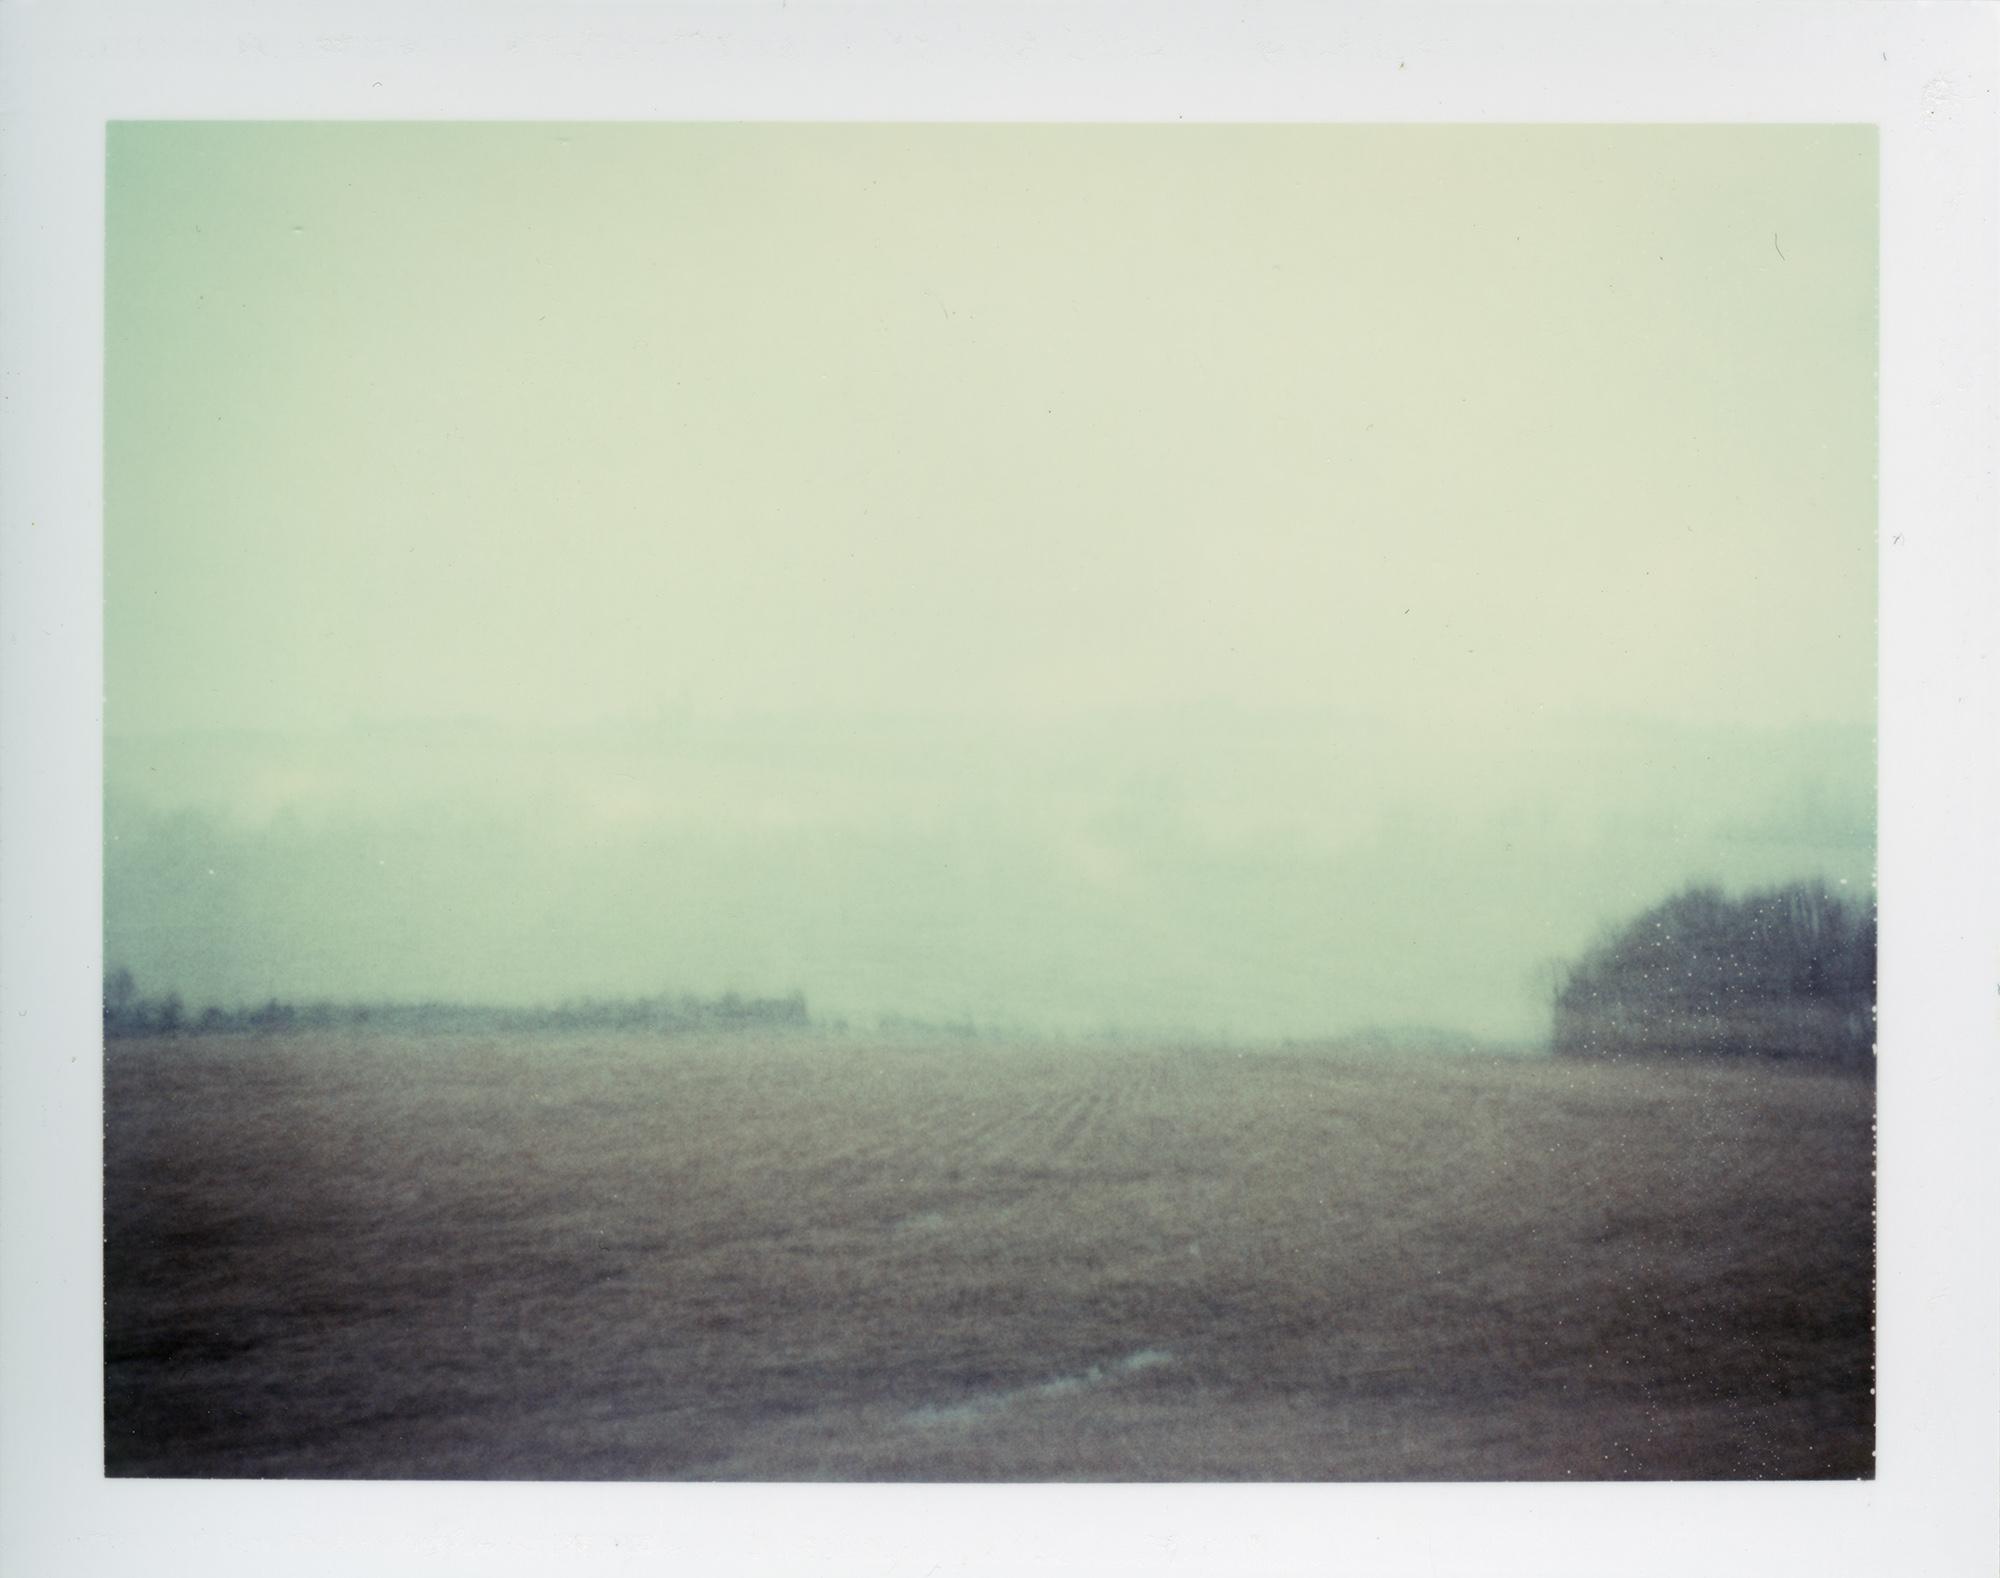 Polaroid_001_final.jpg